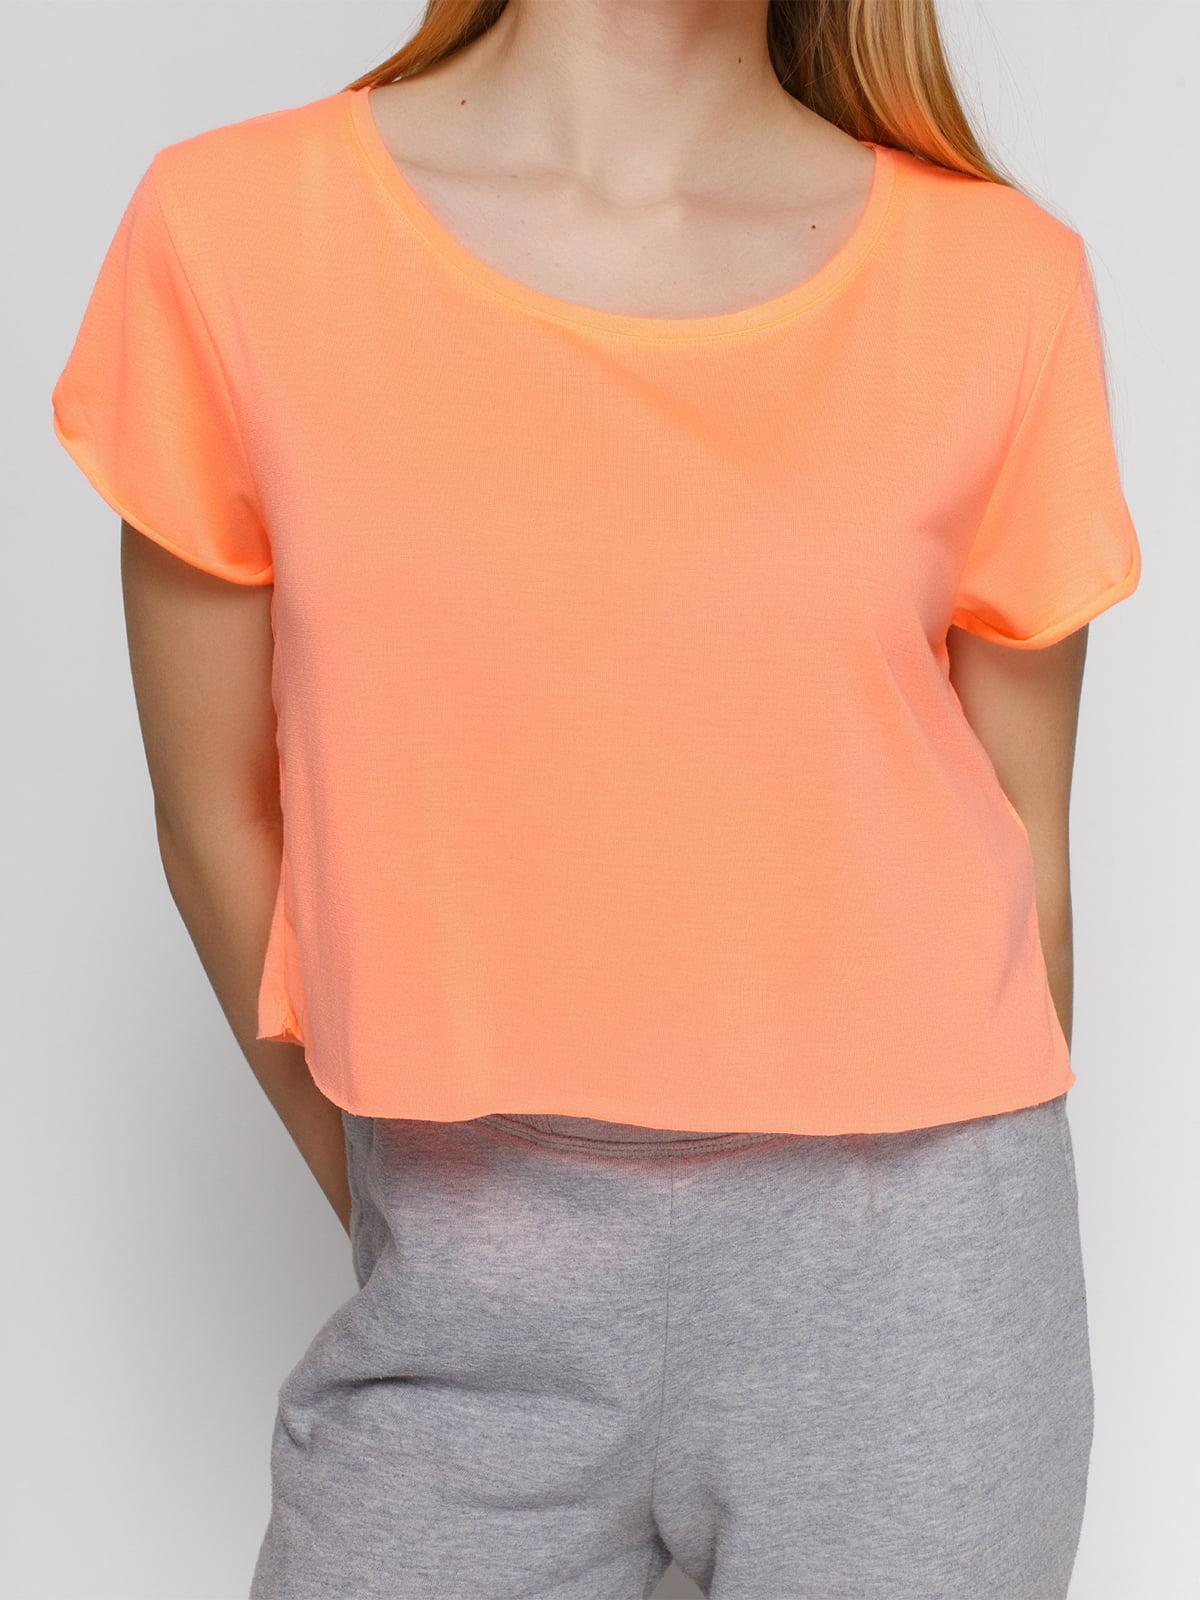 Топ персикового цвета | 3782689 | фото 3